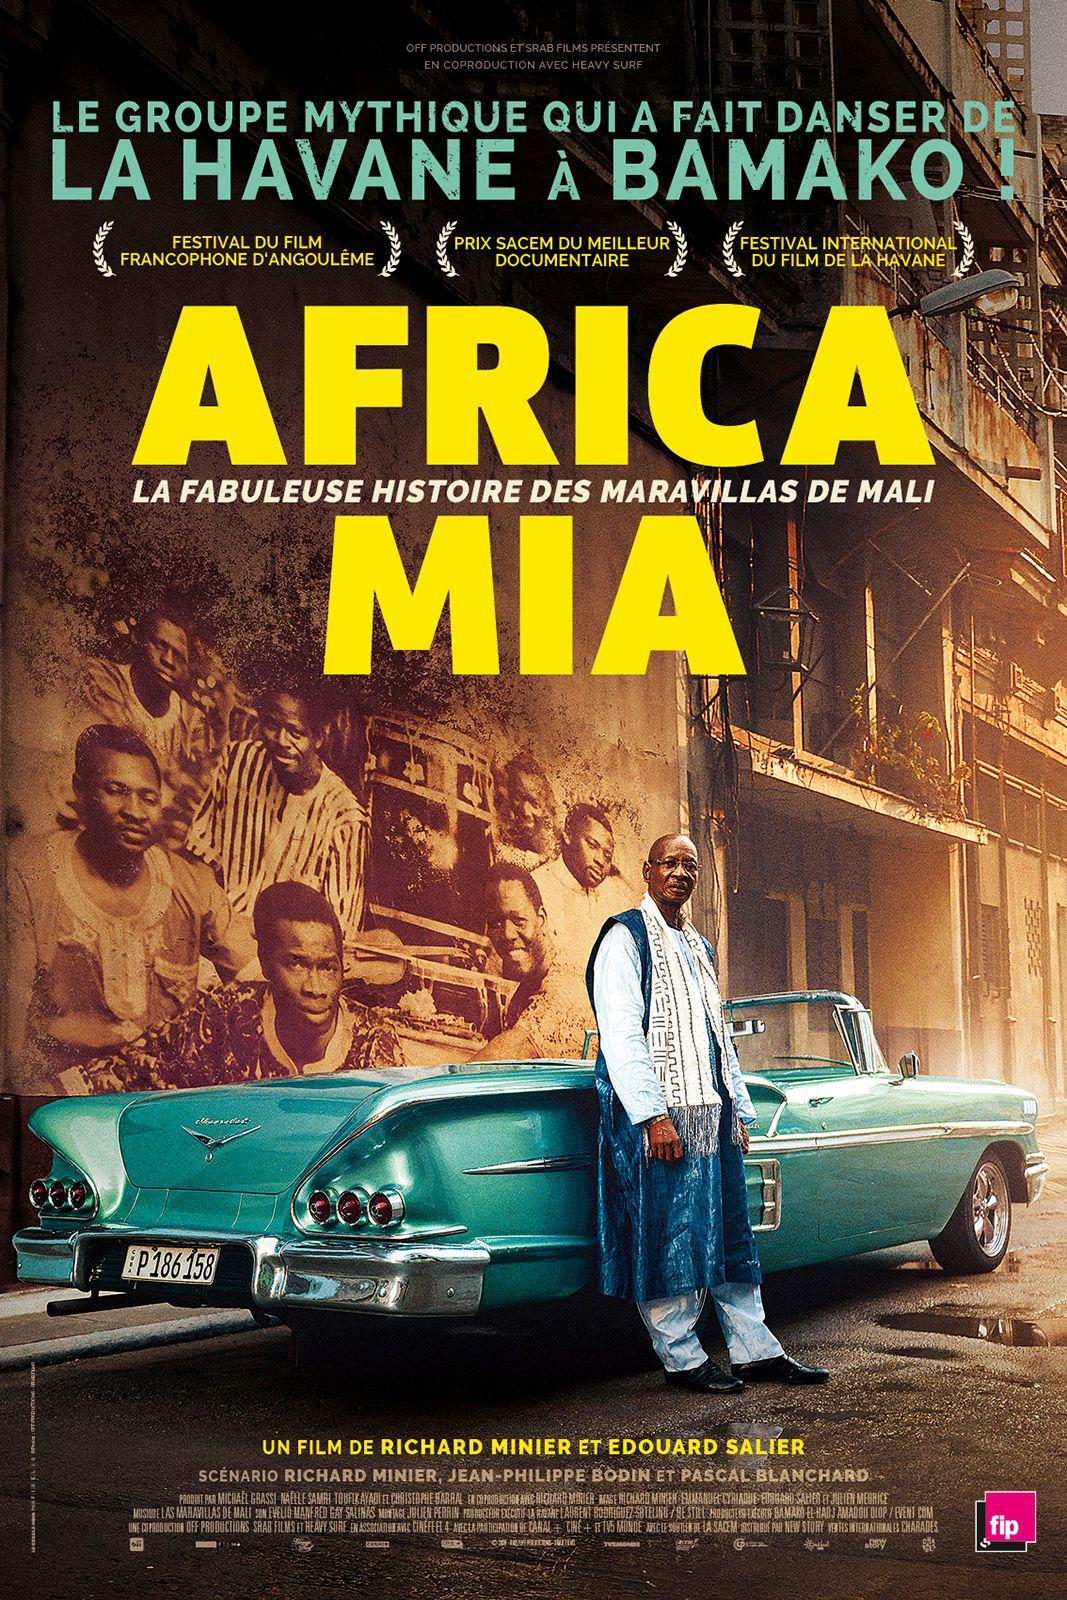 Africa Mia - Documentaire (2020)